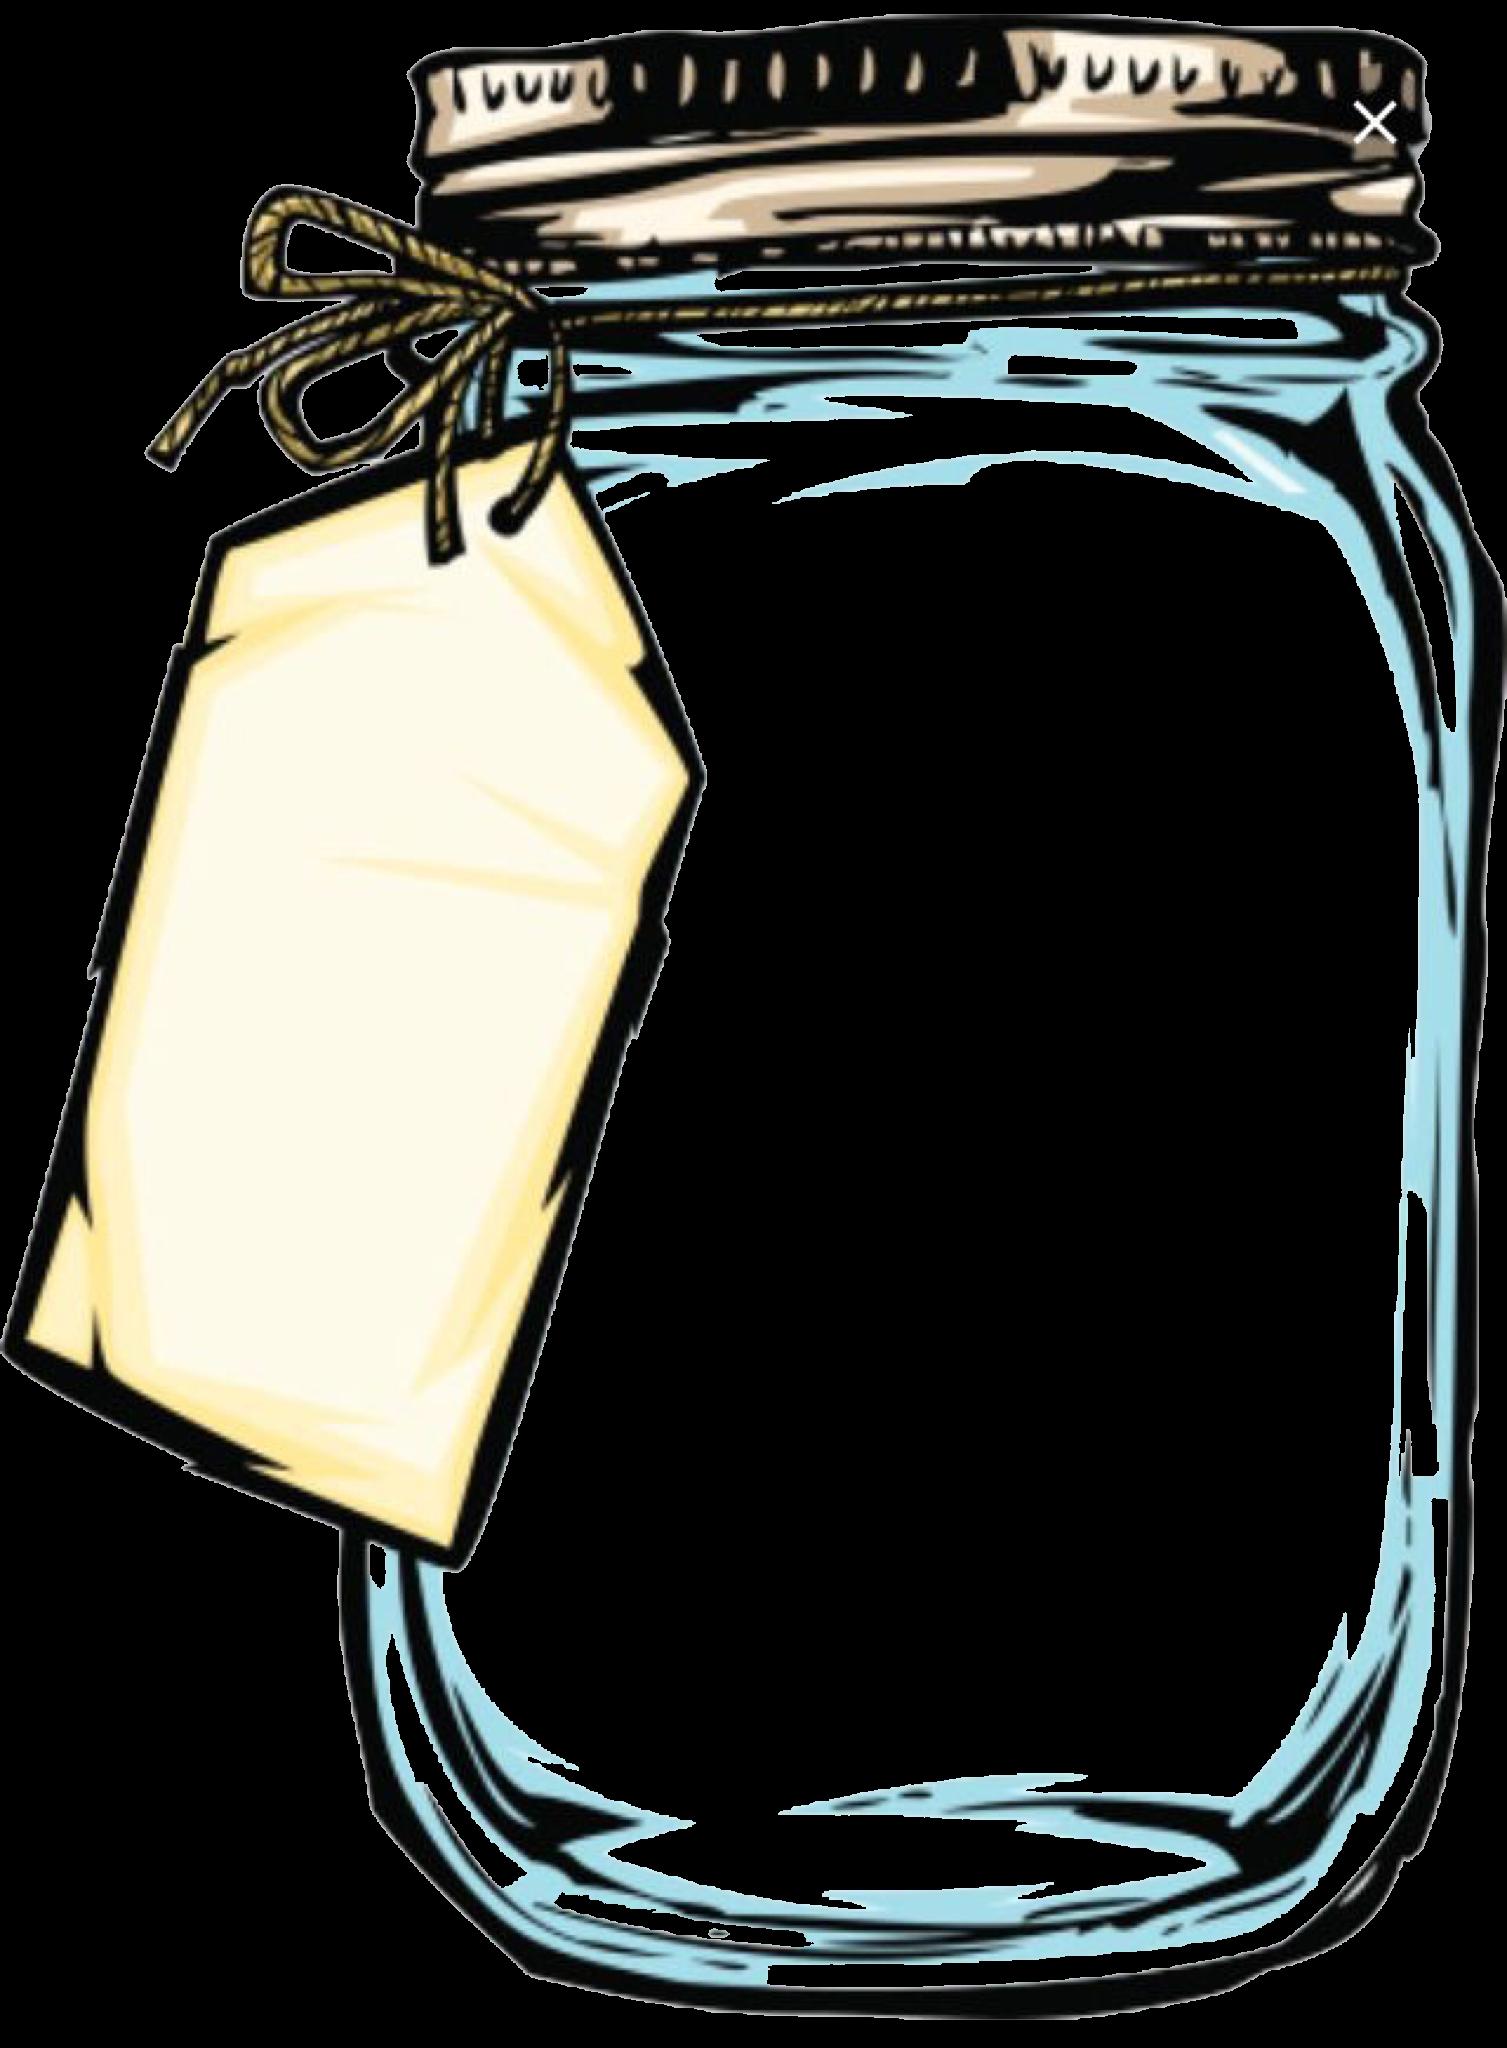 Jar clipart print. Pin by april honeycutt